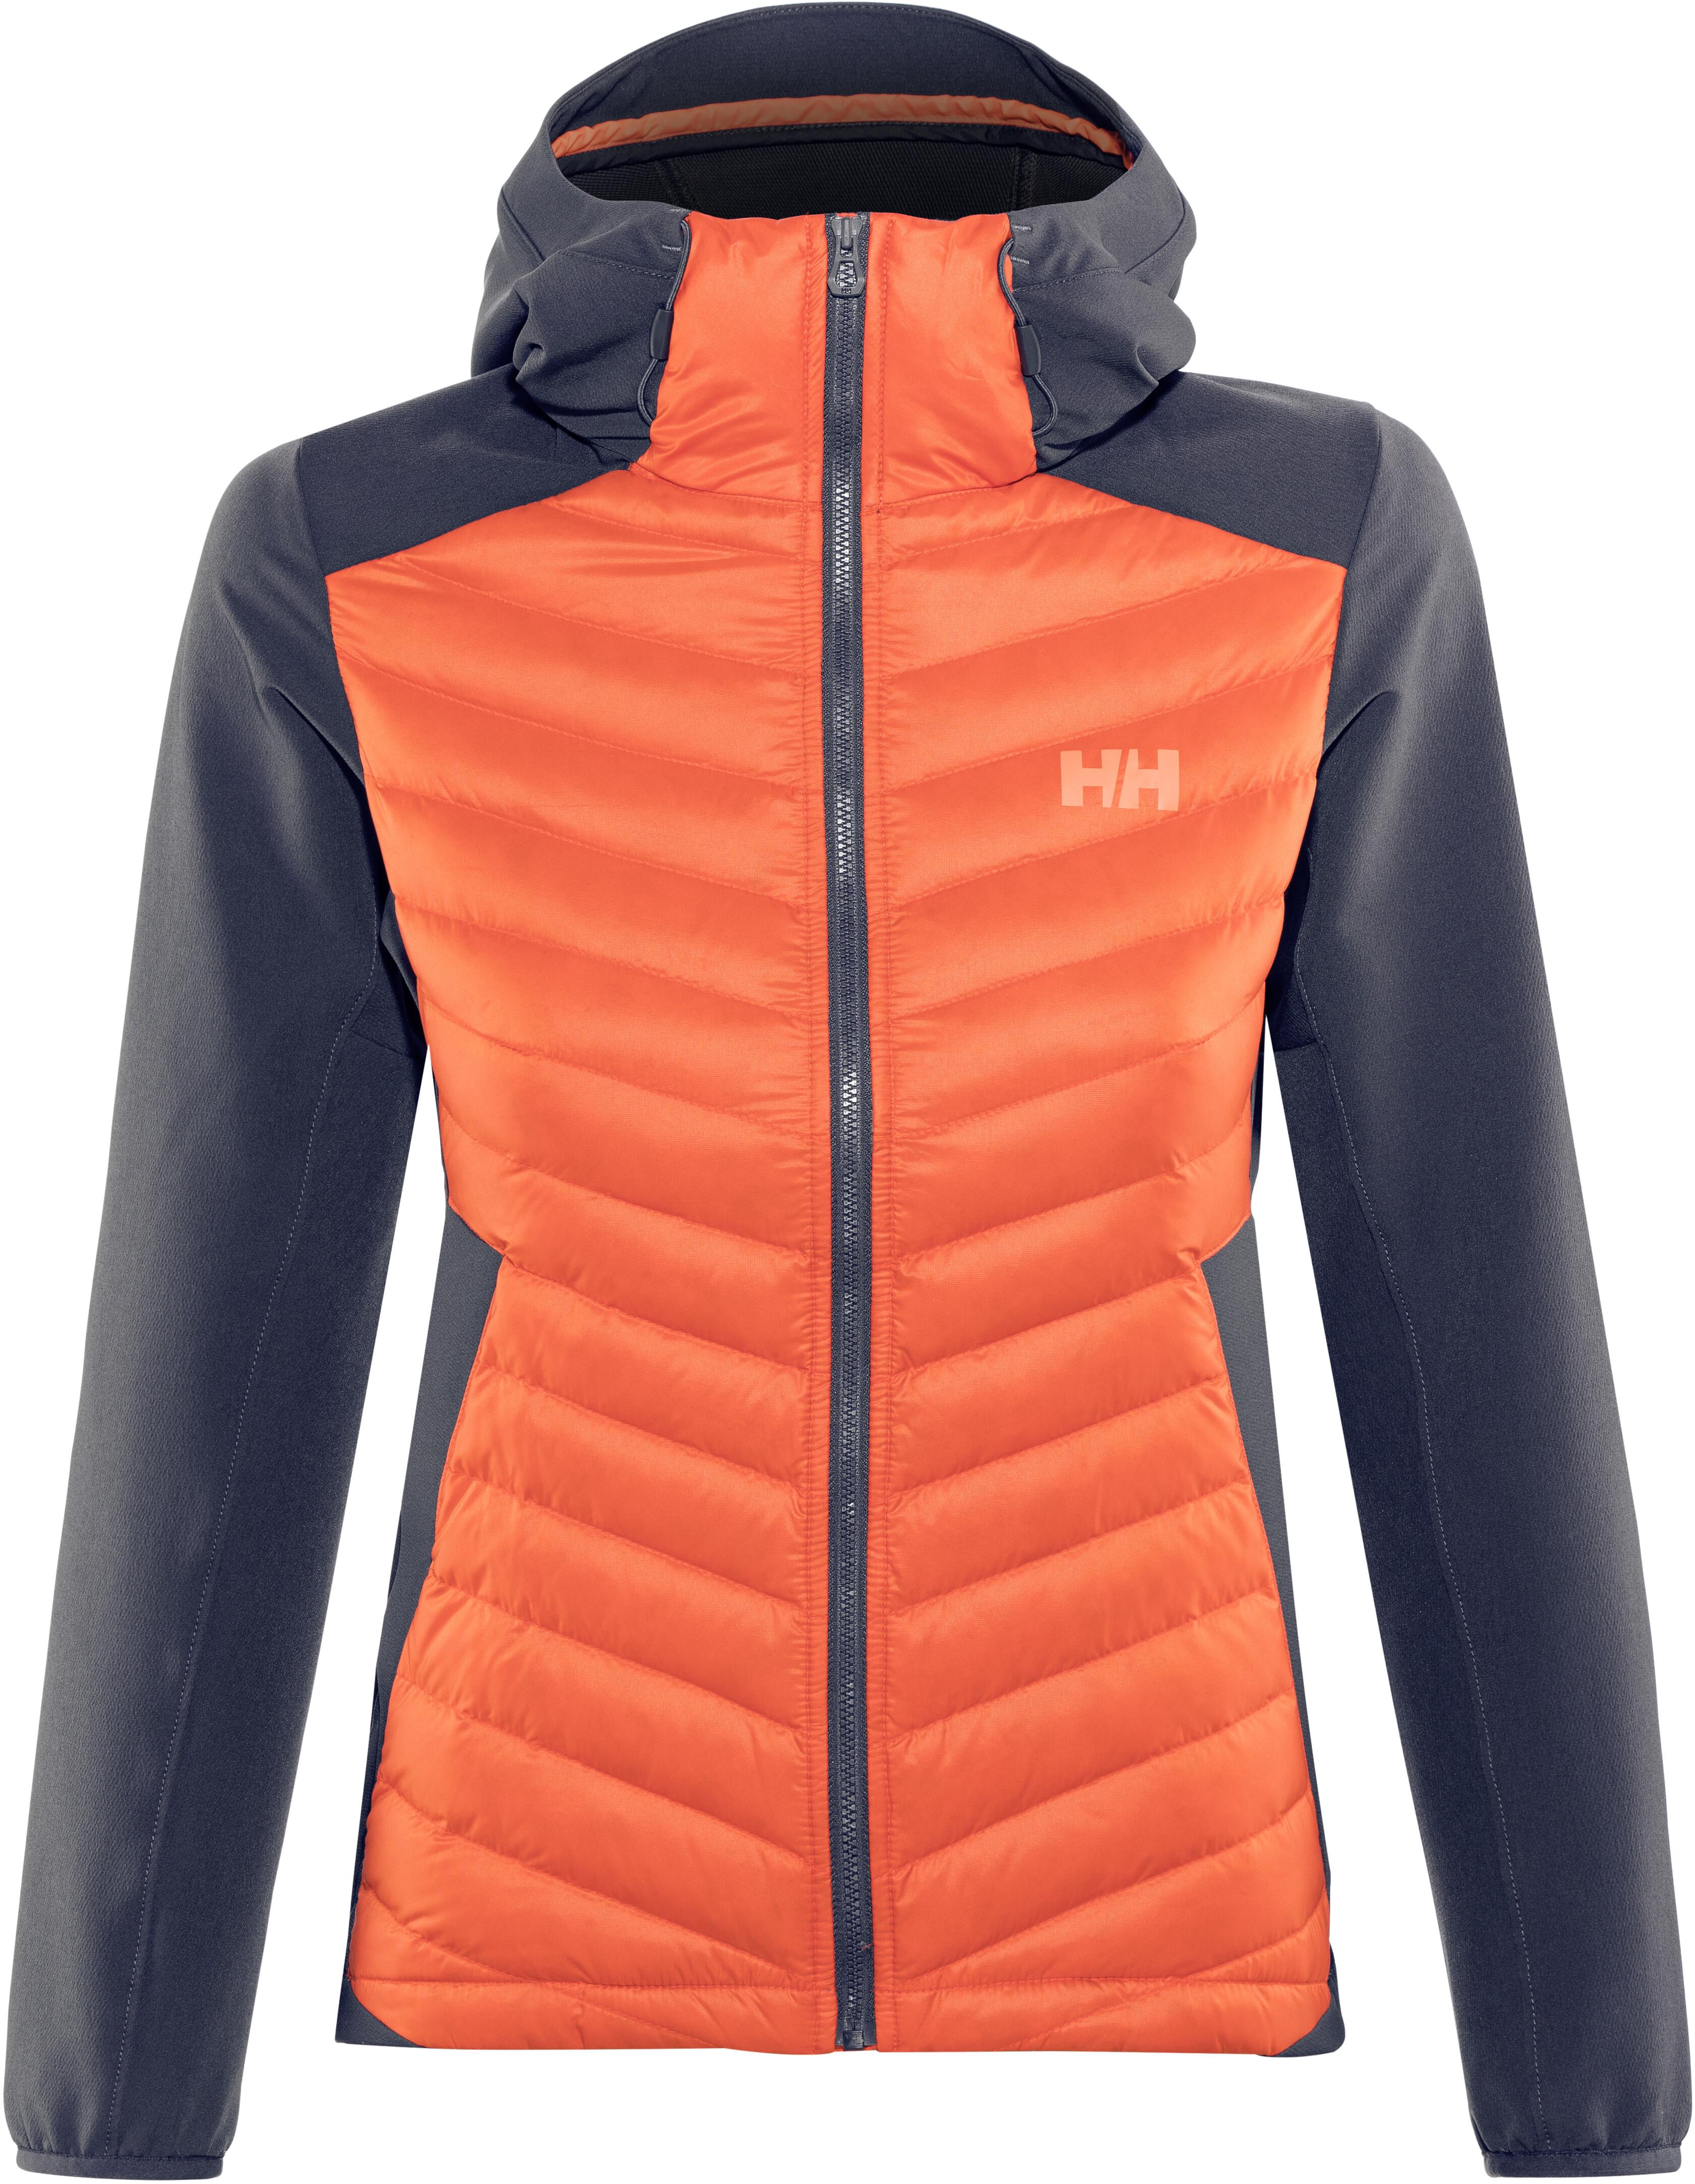 64edbdaafda06 Helly Hansen Verglas Light Jacket Women grenadine